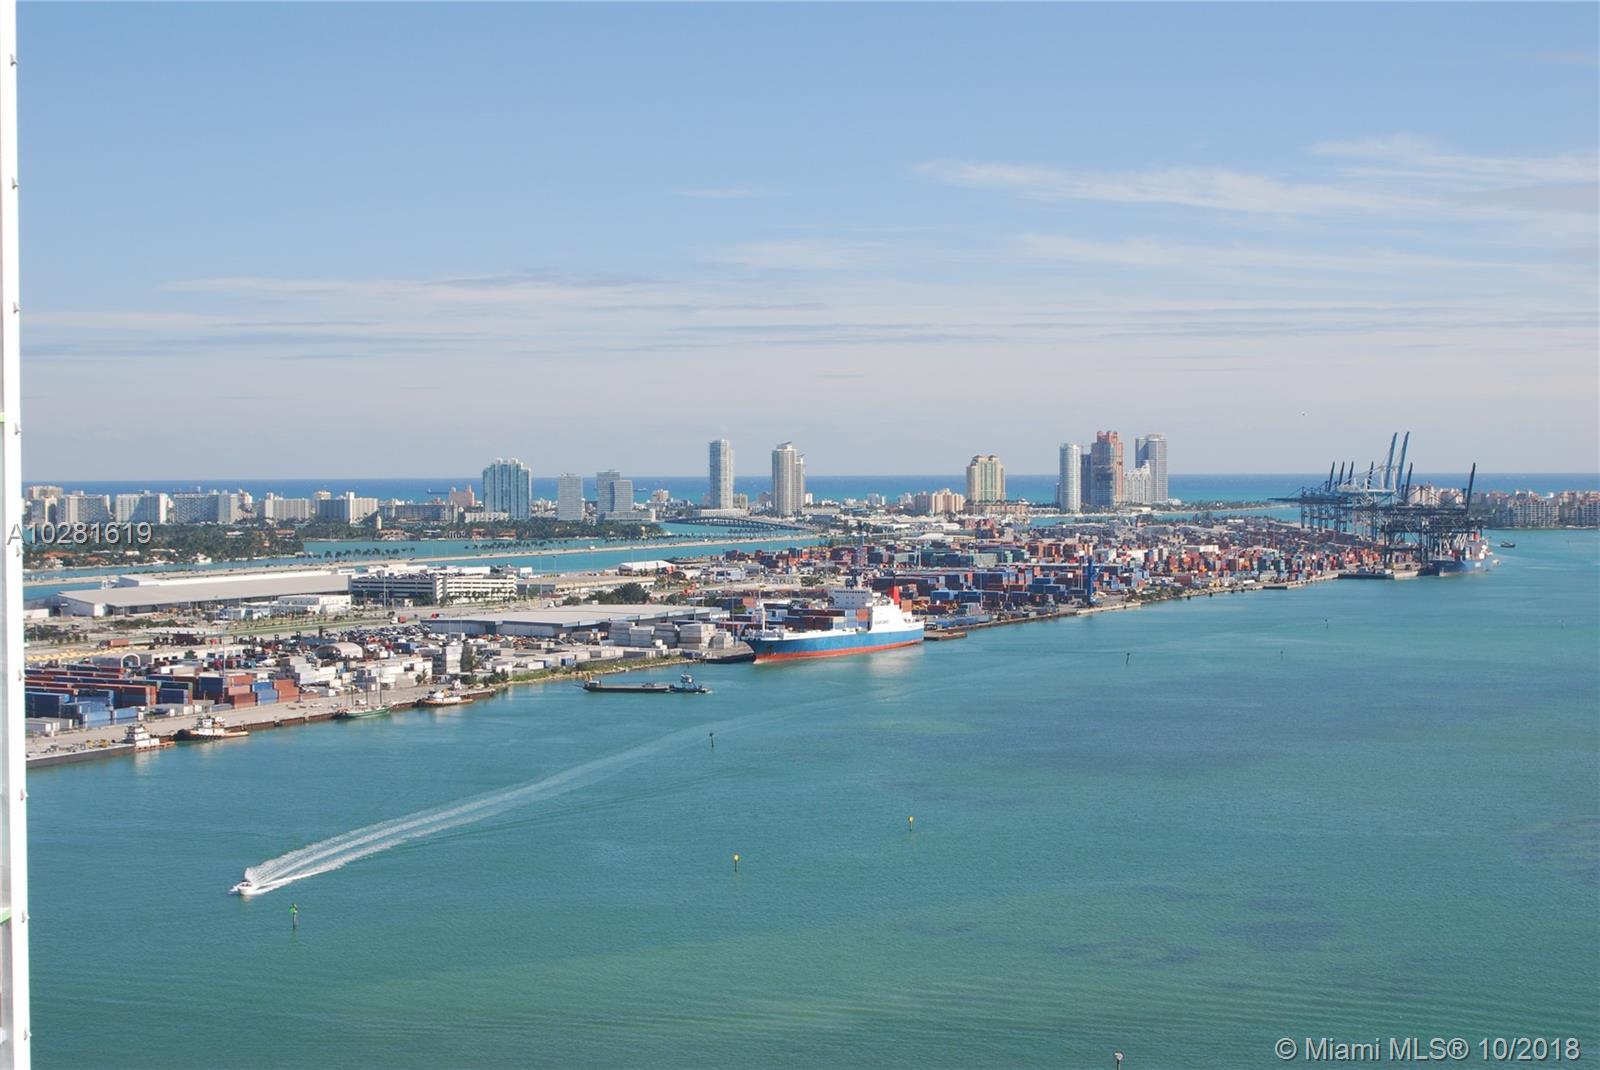 325 S Biscayne Boulevard, 3323 - Miami, Florida